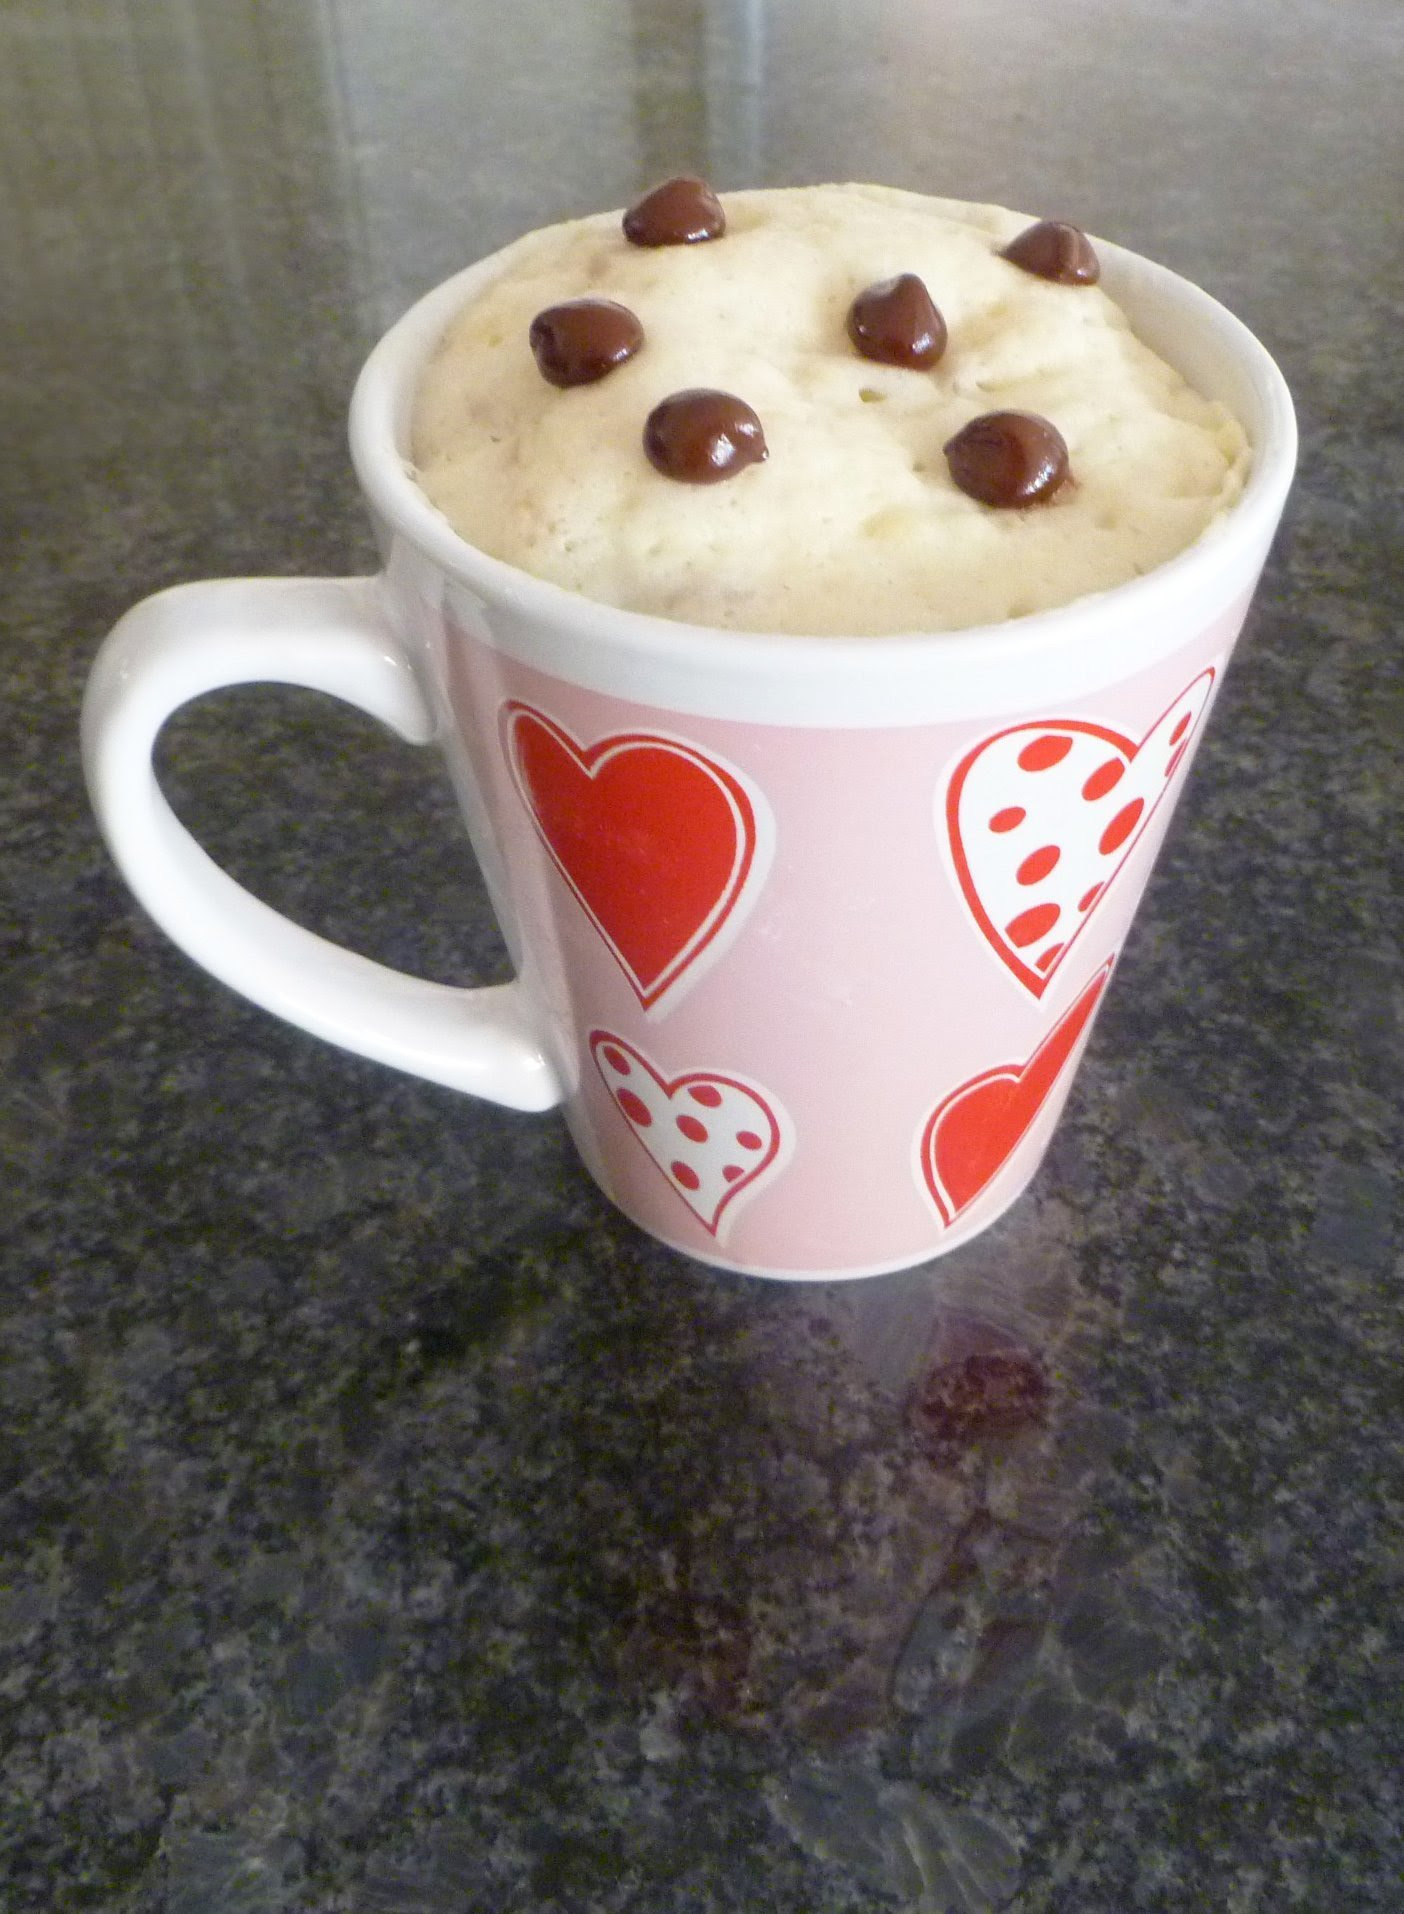 Chocolate Chip Banana Mug Cake - This Happy Mommy